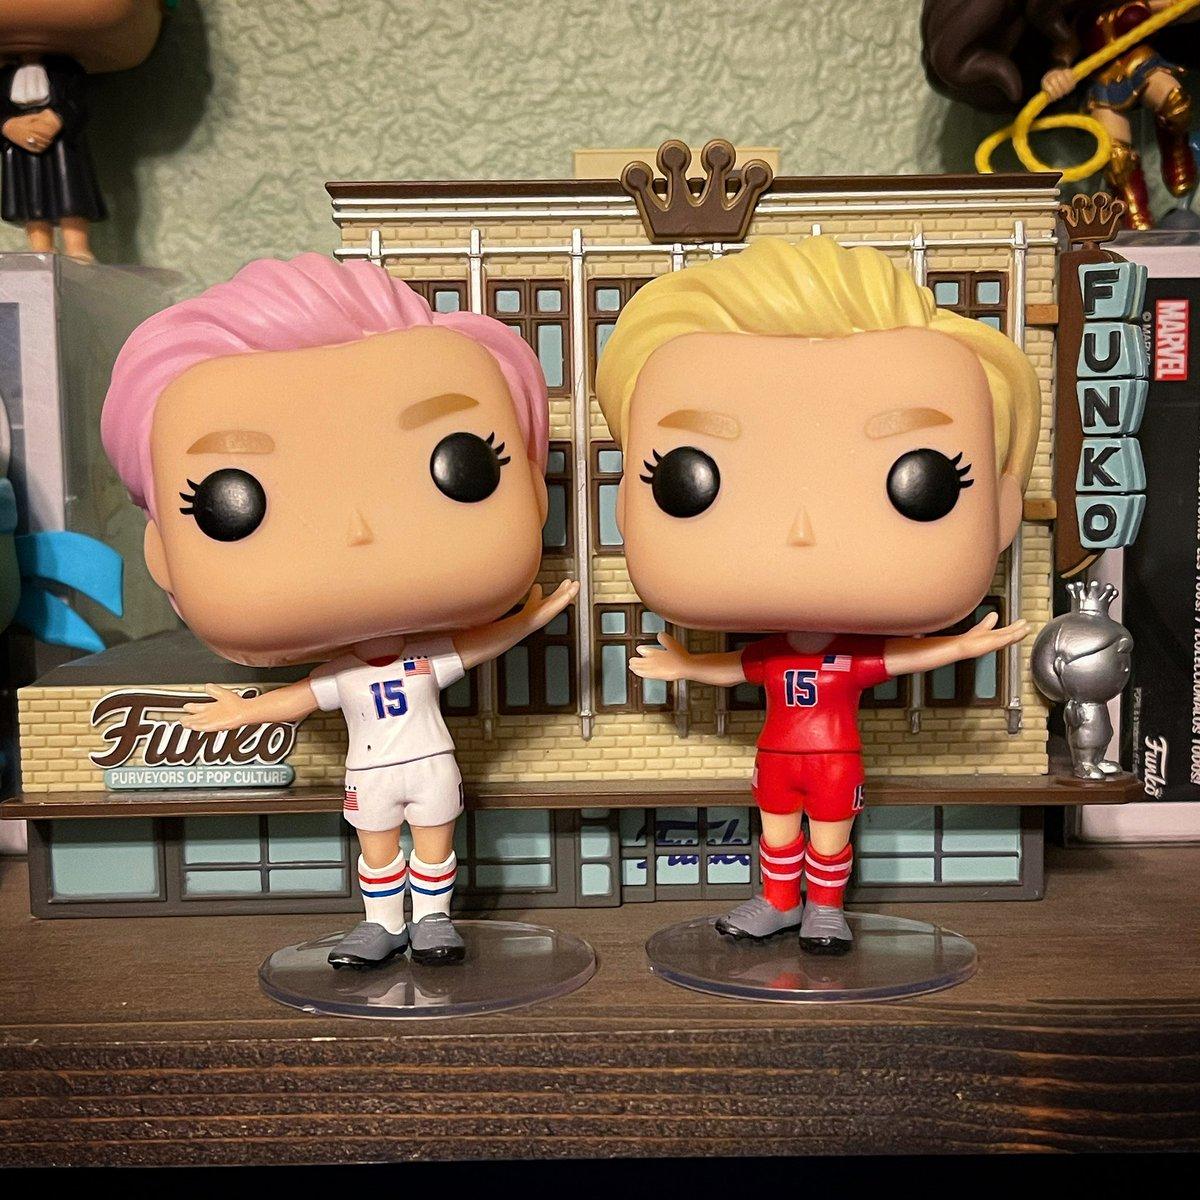 Today's #FunkoWomenOfPower selection is Megan Rapinoe x2! 🔥💯⚽️  #funko #soccer #uswnt #meganrapinoe #coloradofunko @OriginalFunko